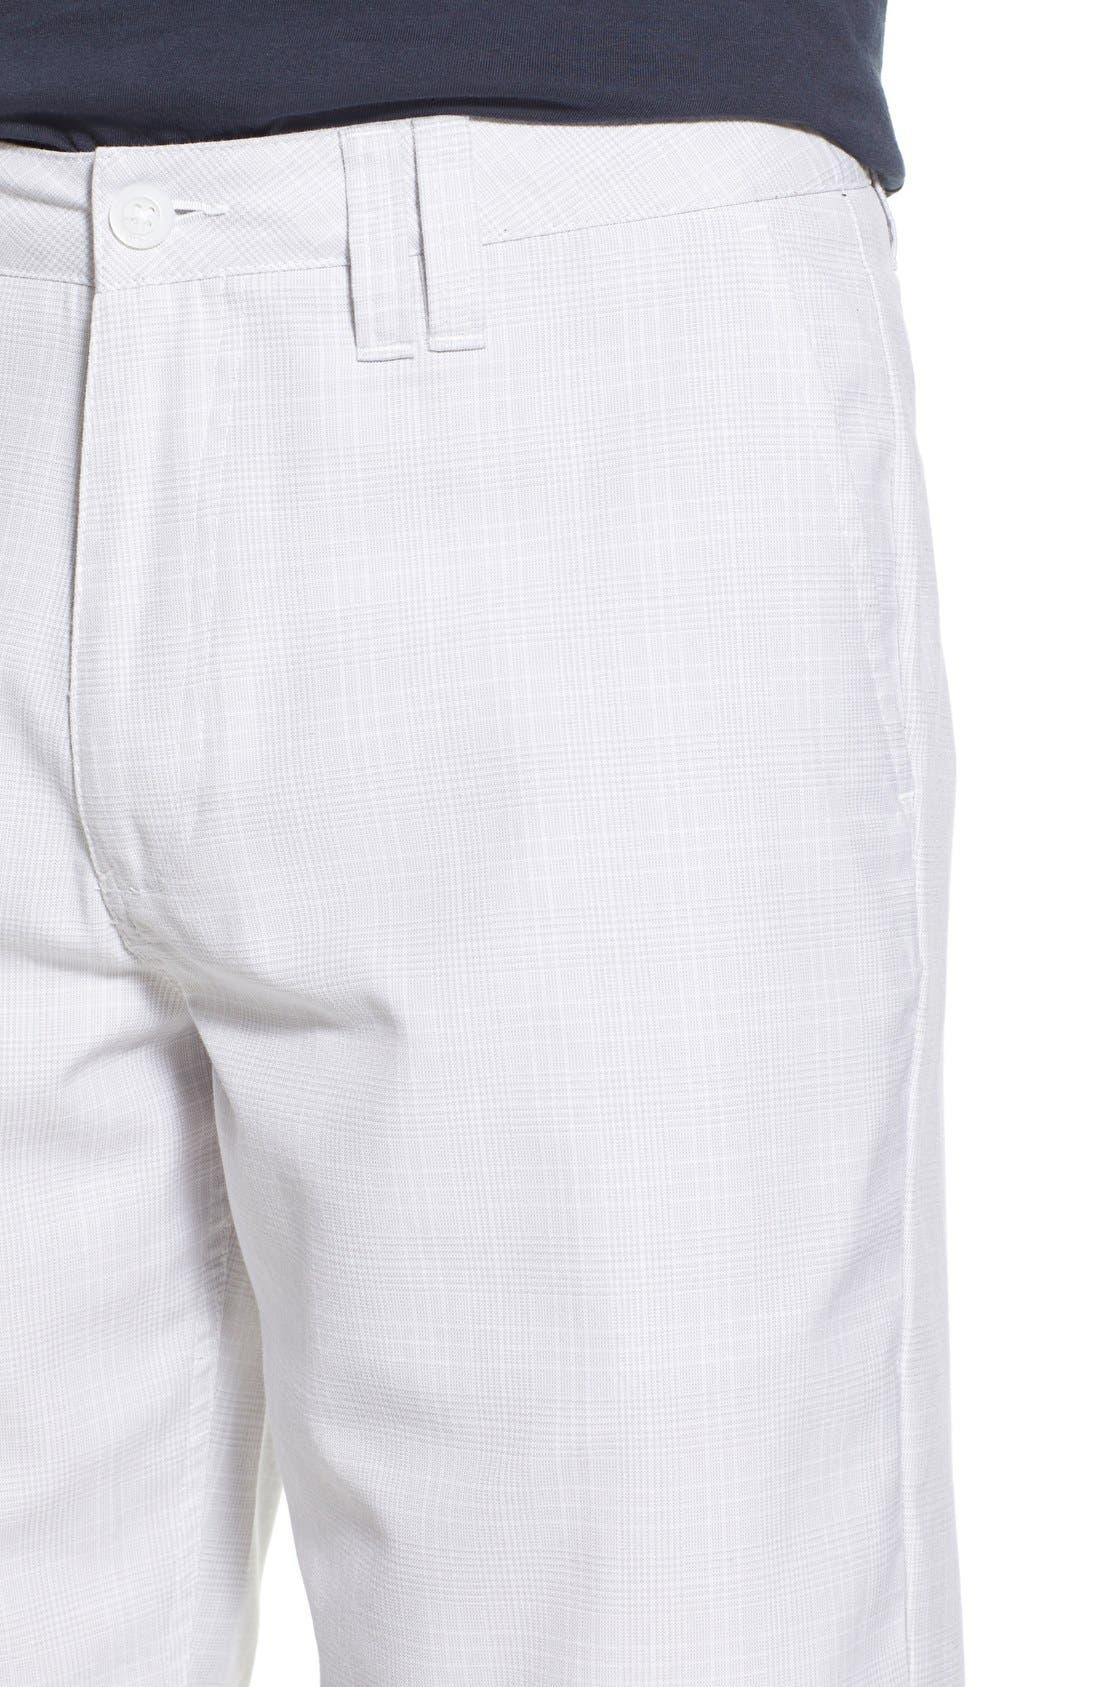 'Delta Plaid' Chino Shorts,                             Alternate thumbnail 18, color,